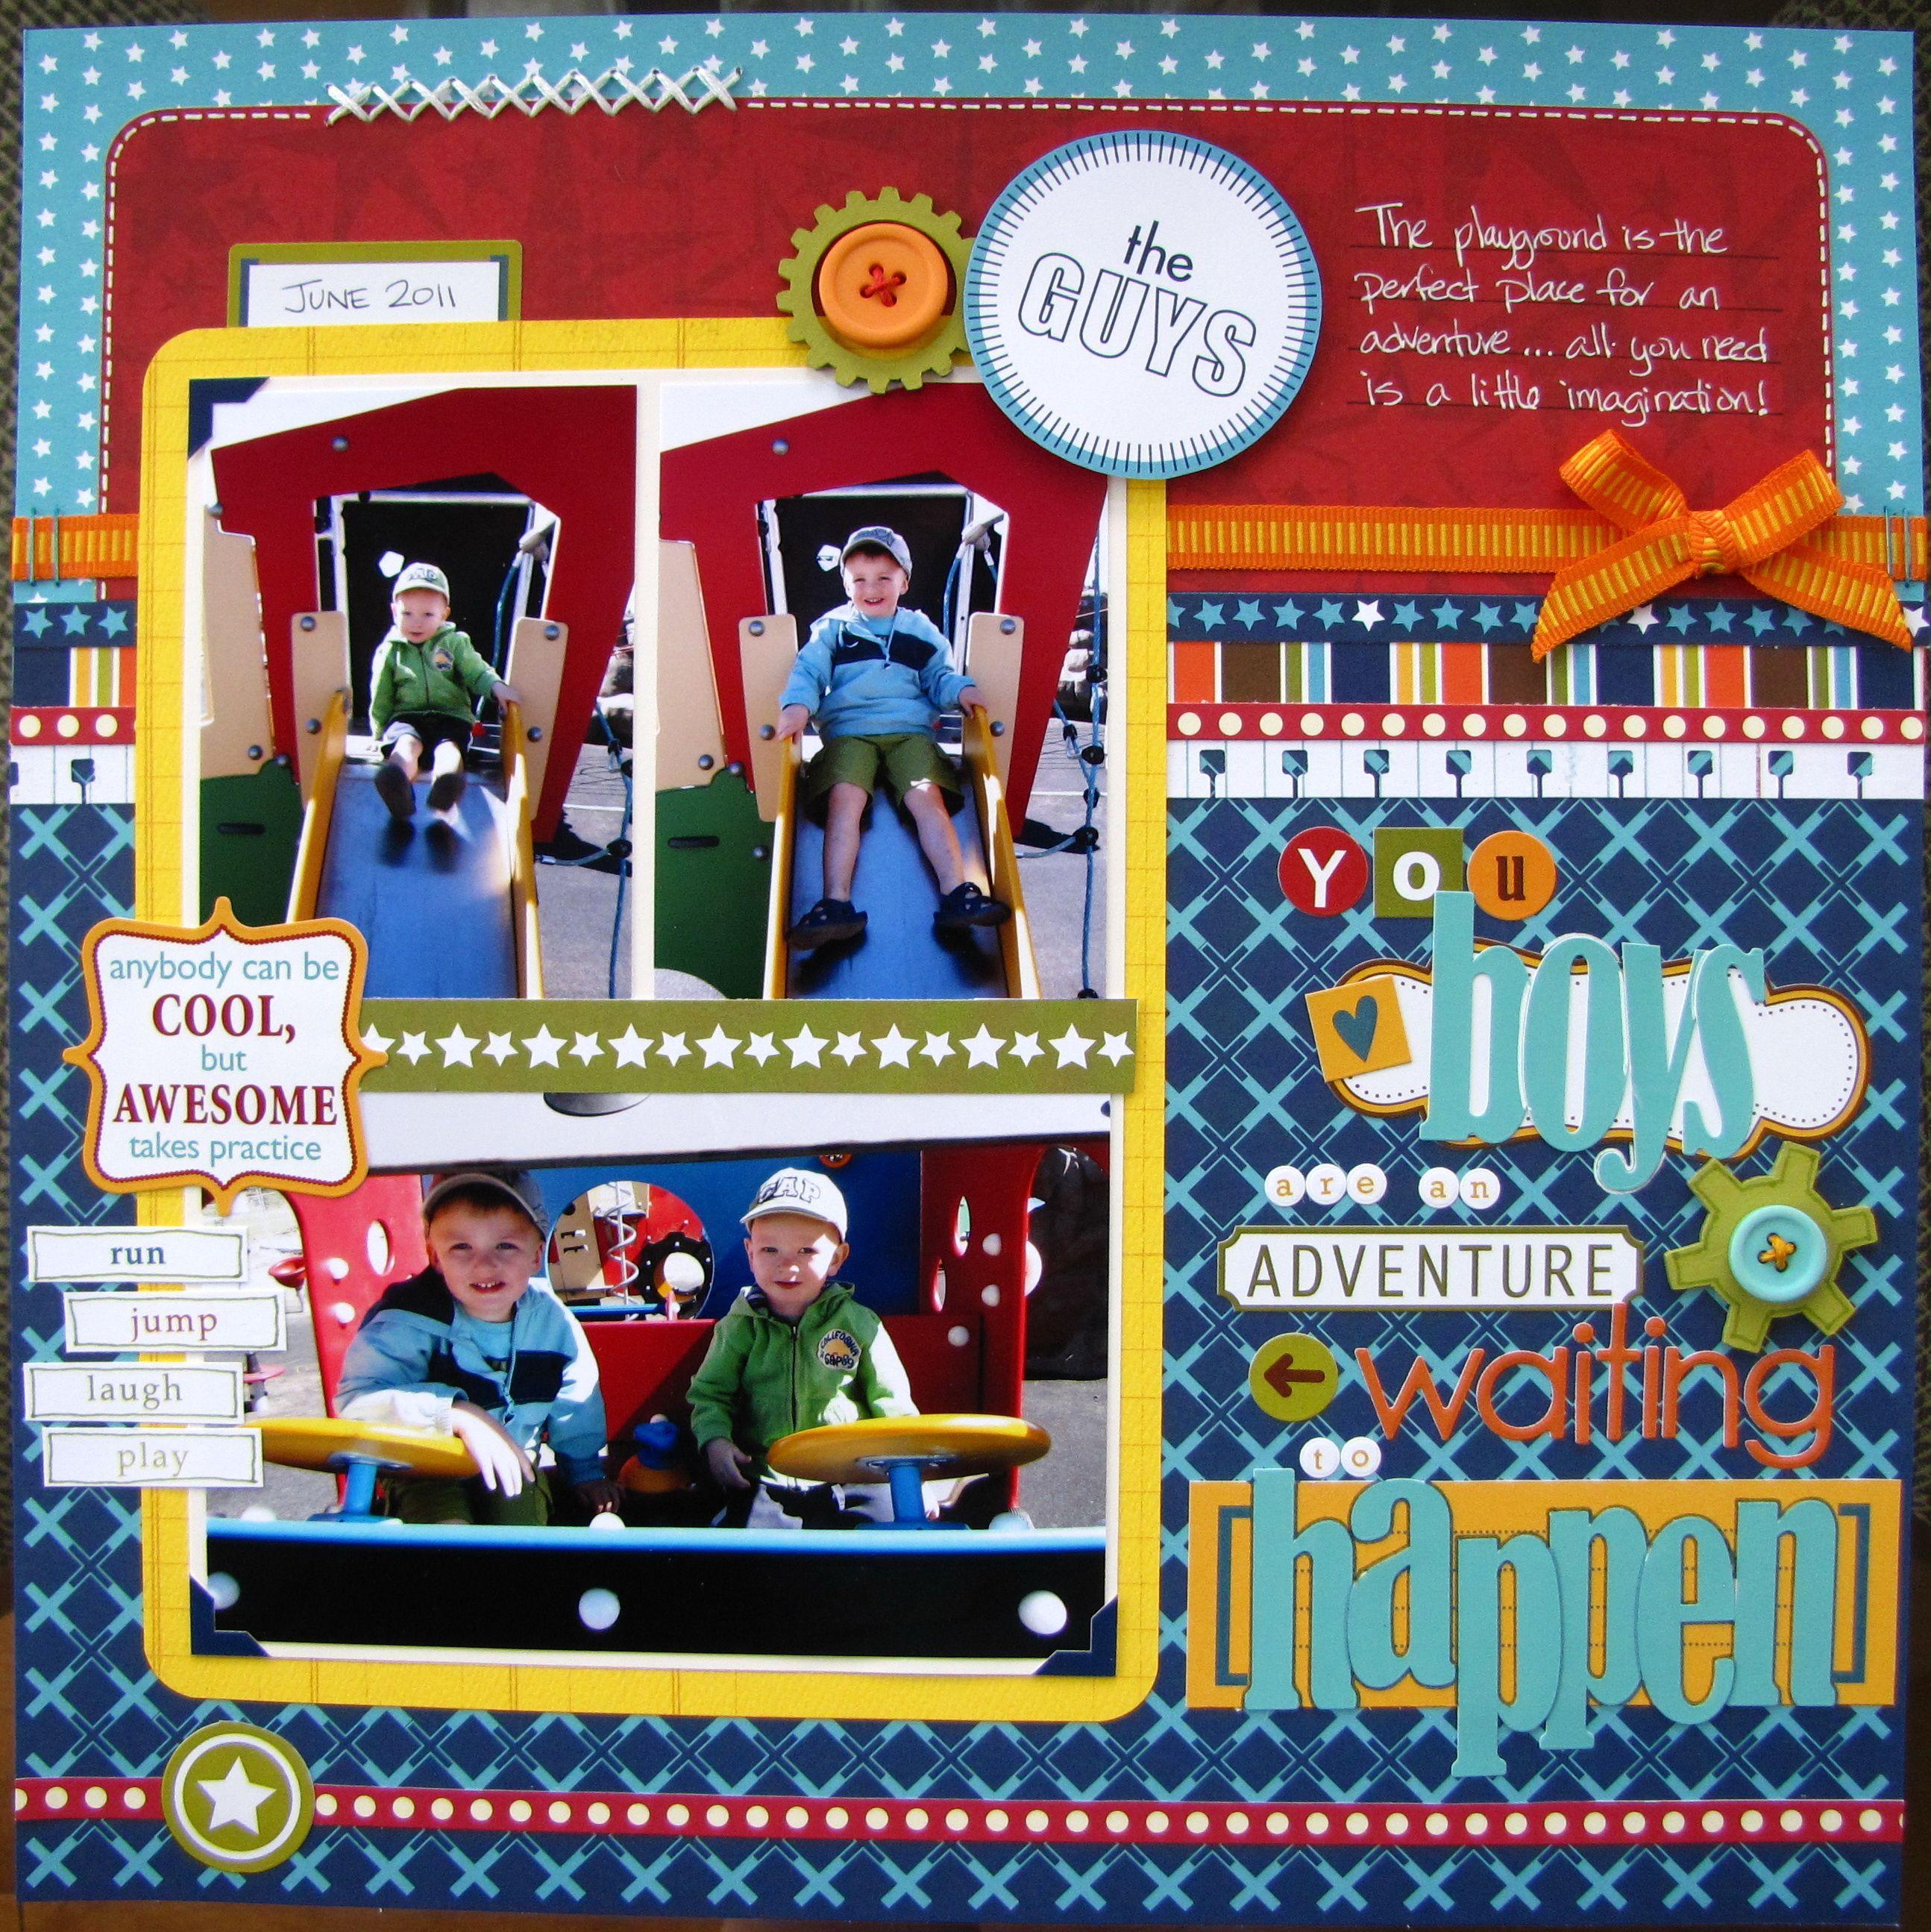 Scrapbook ideas adventure - Great Colors You Boys Are An Adventure Waiting To Happen Scrapbook Com